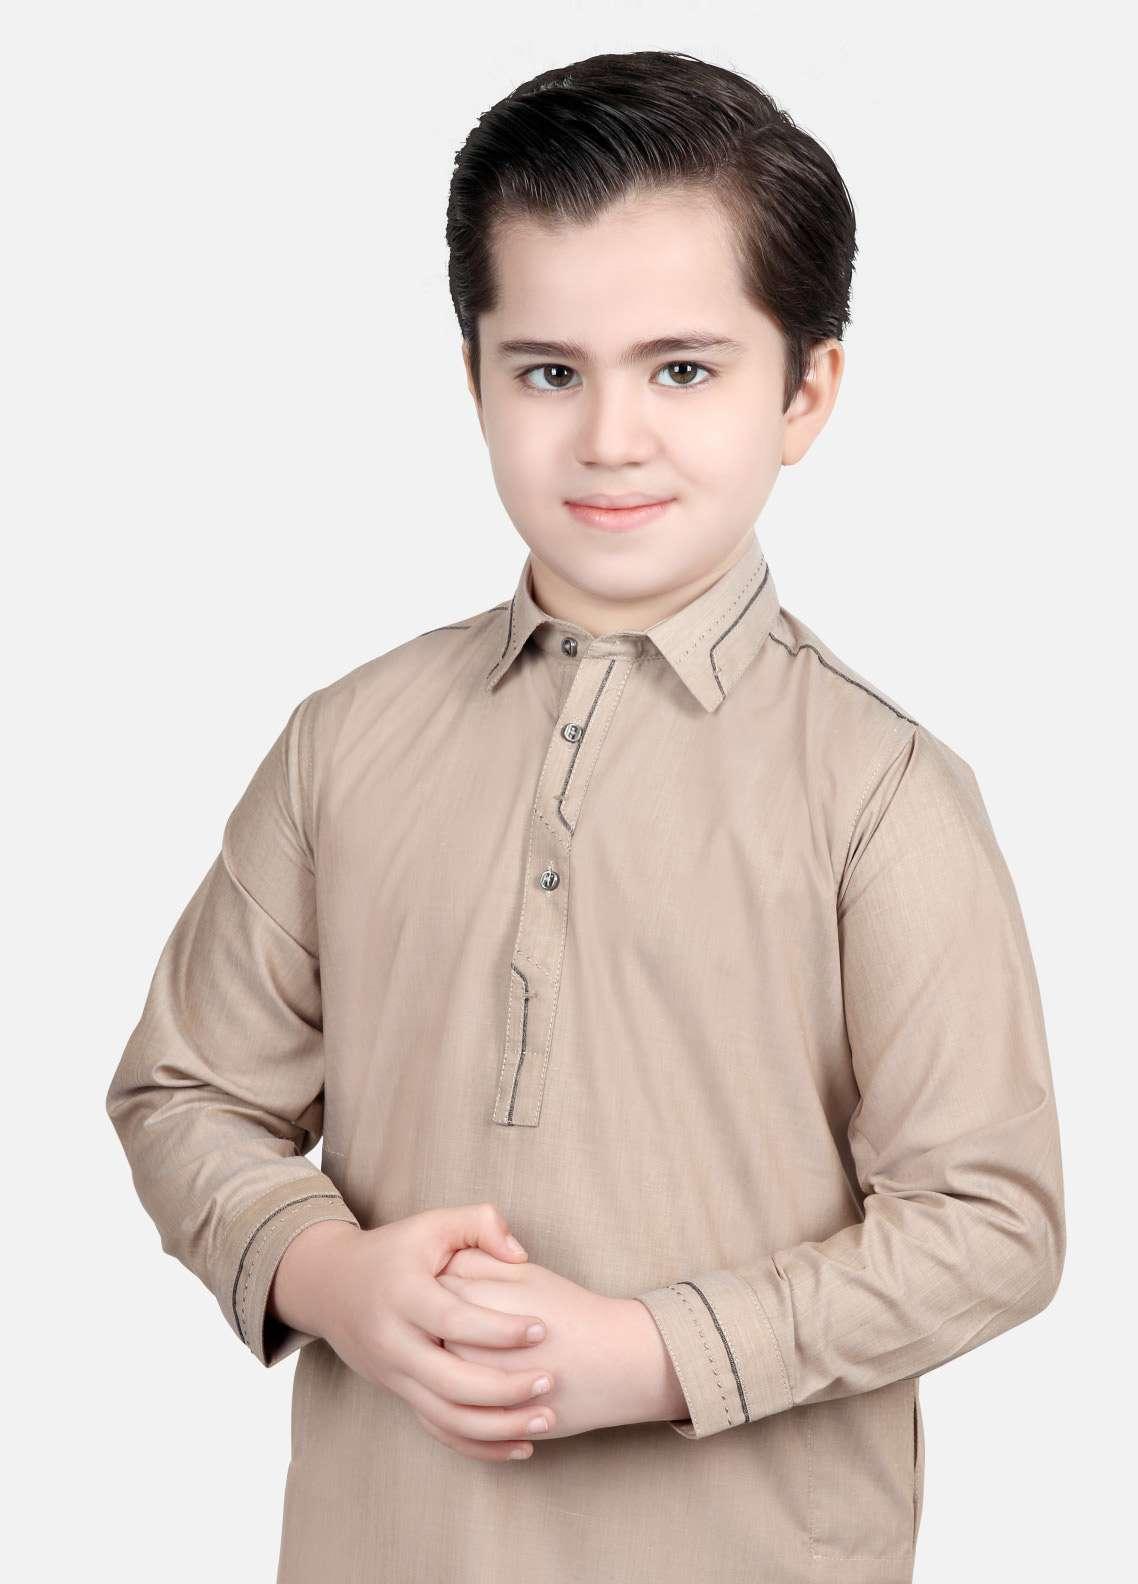 Edenrobe Cotton Plain Texture Boys Kameez Shalwar - Beige EDS18B 3543